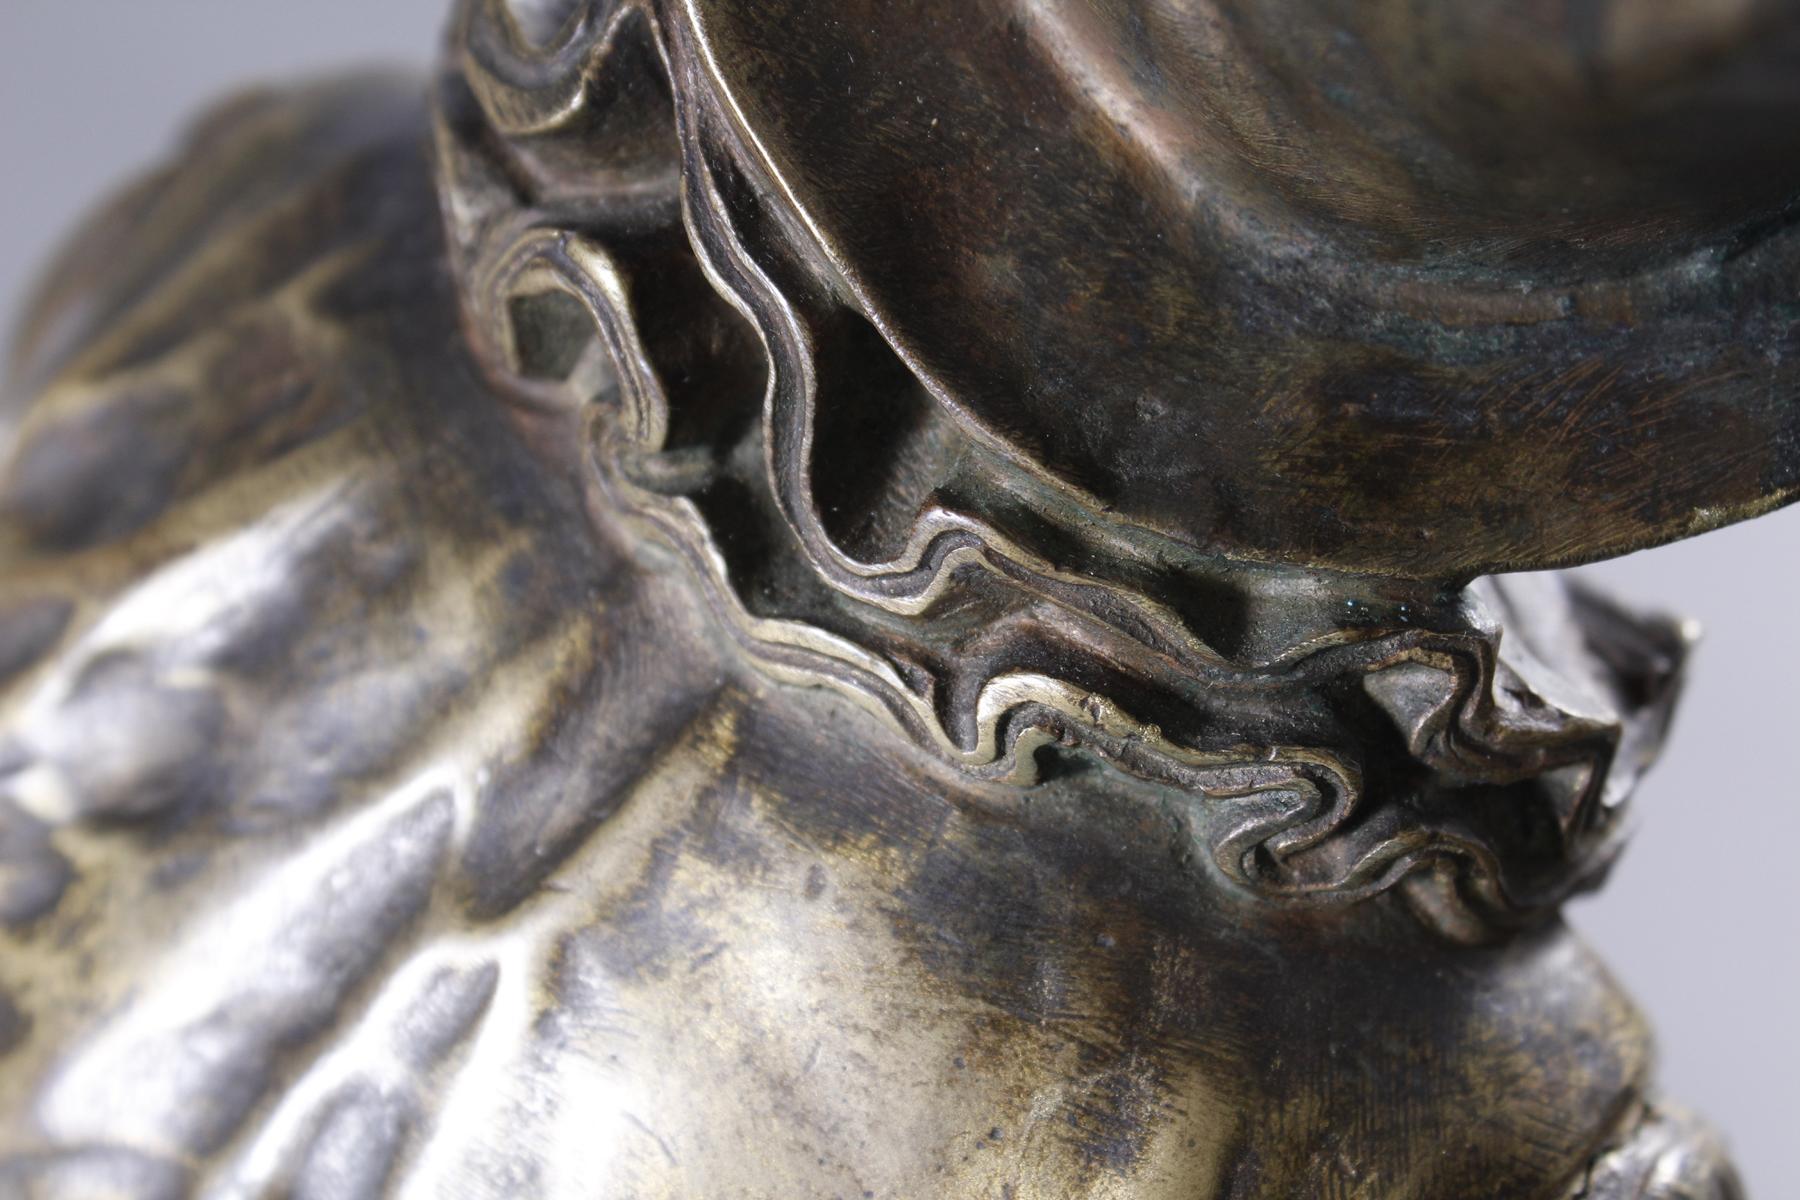 Eutrope Bouret (1833-1906), Bronzeskulptur 'Au claire de la Lune' um 1890/1900-9